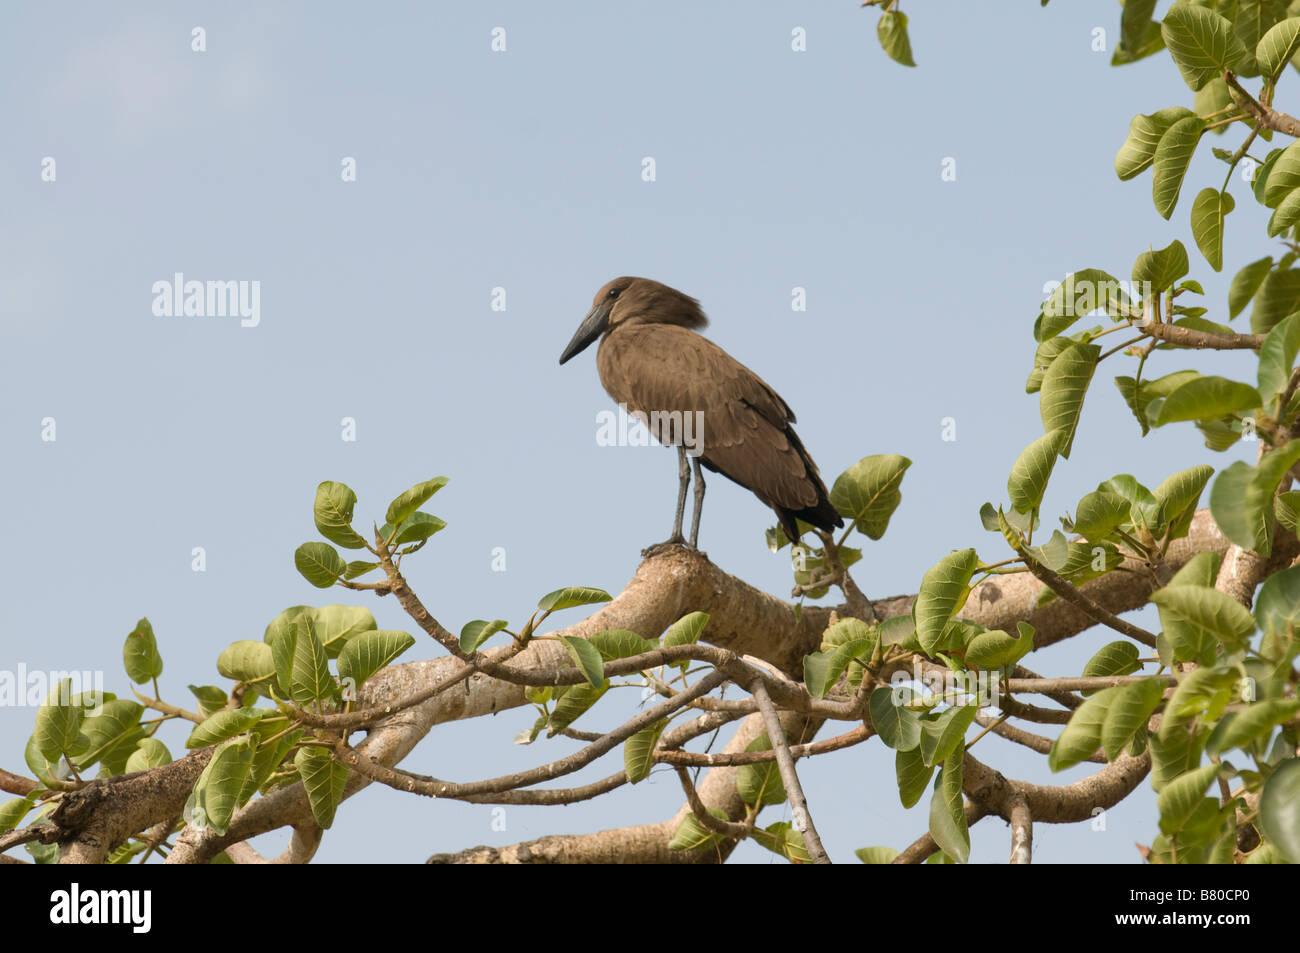 Icebird Awasa Ethiopia Africa - Stock Image